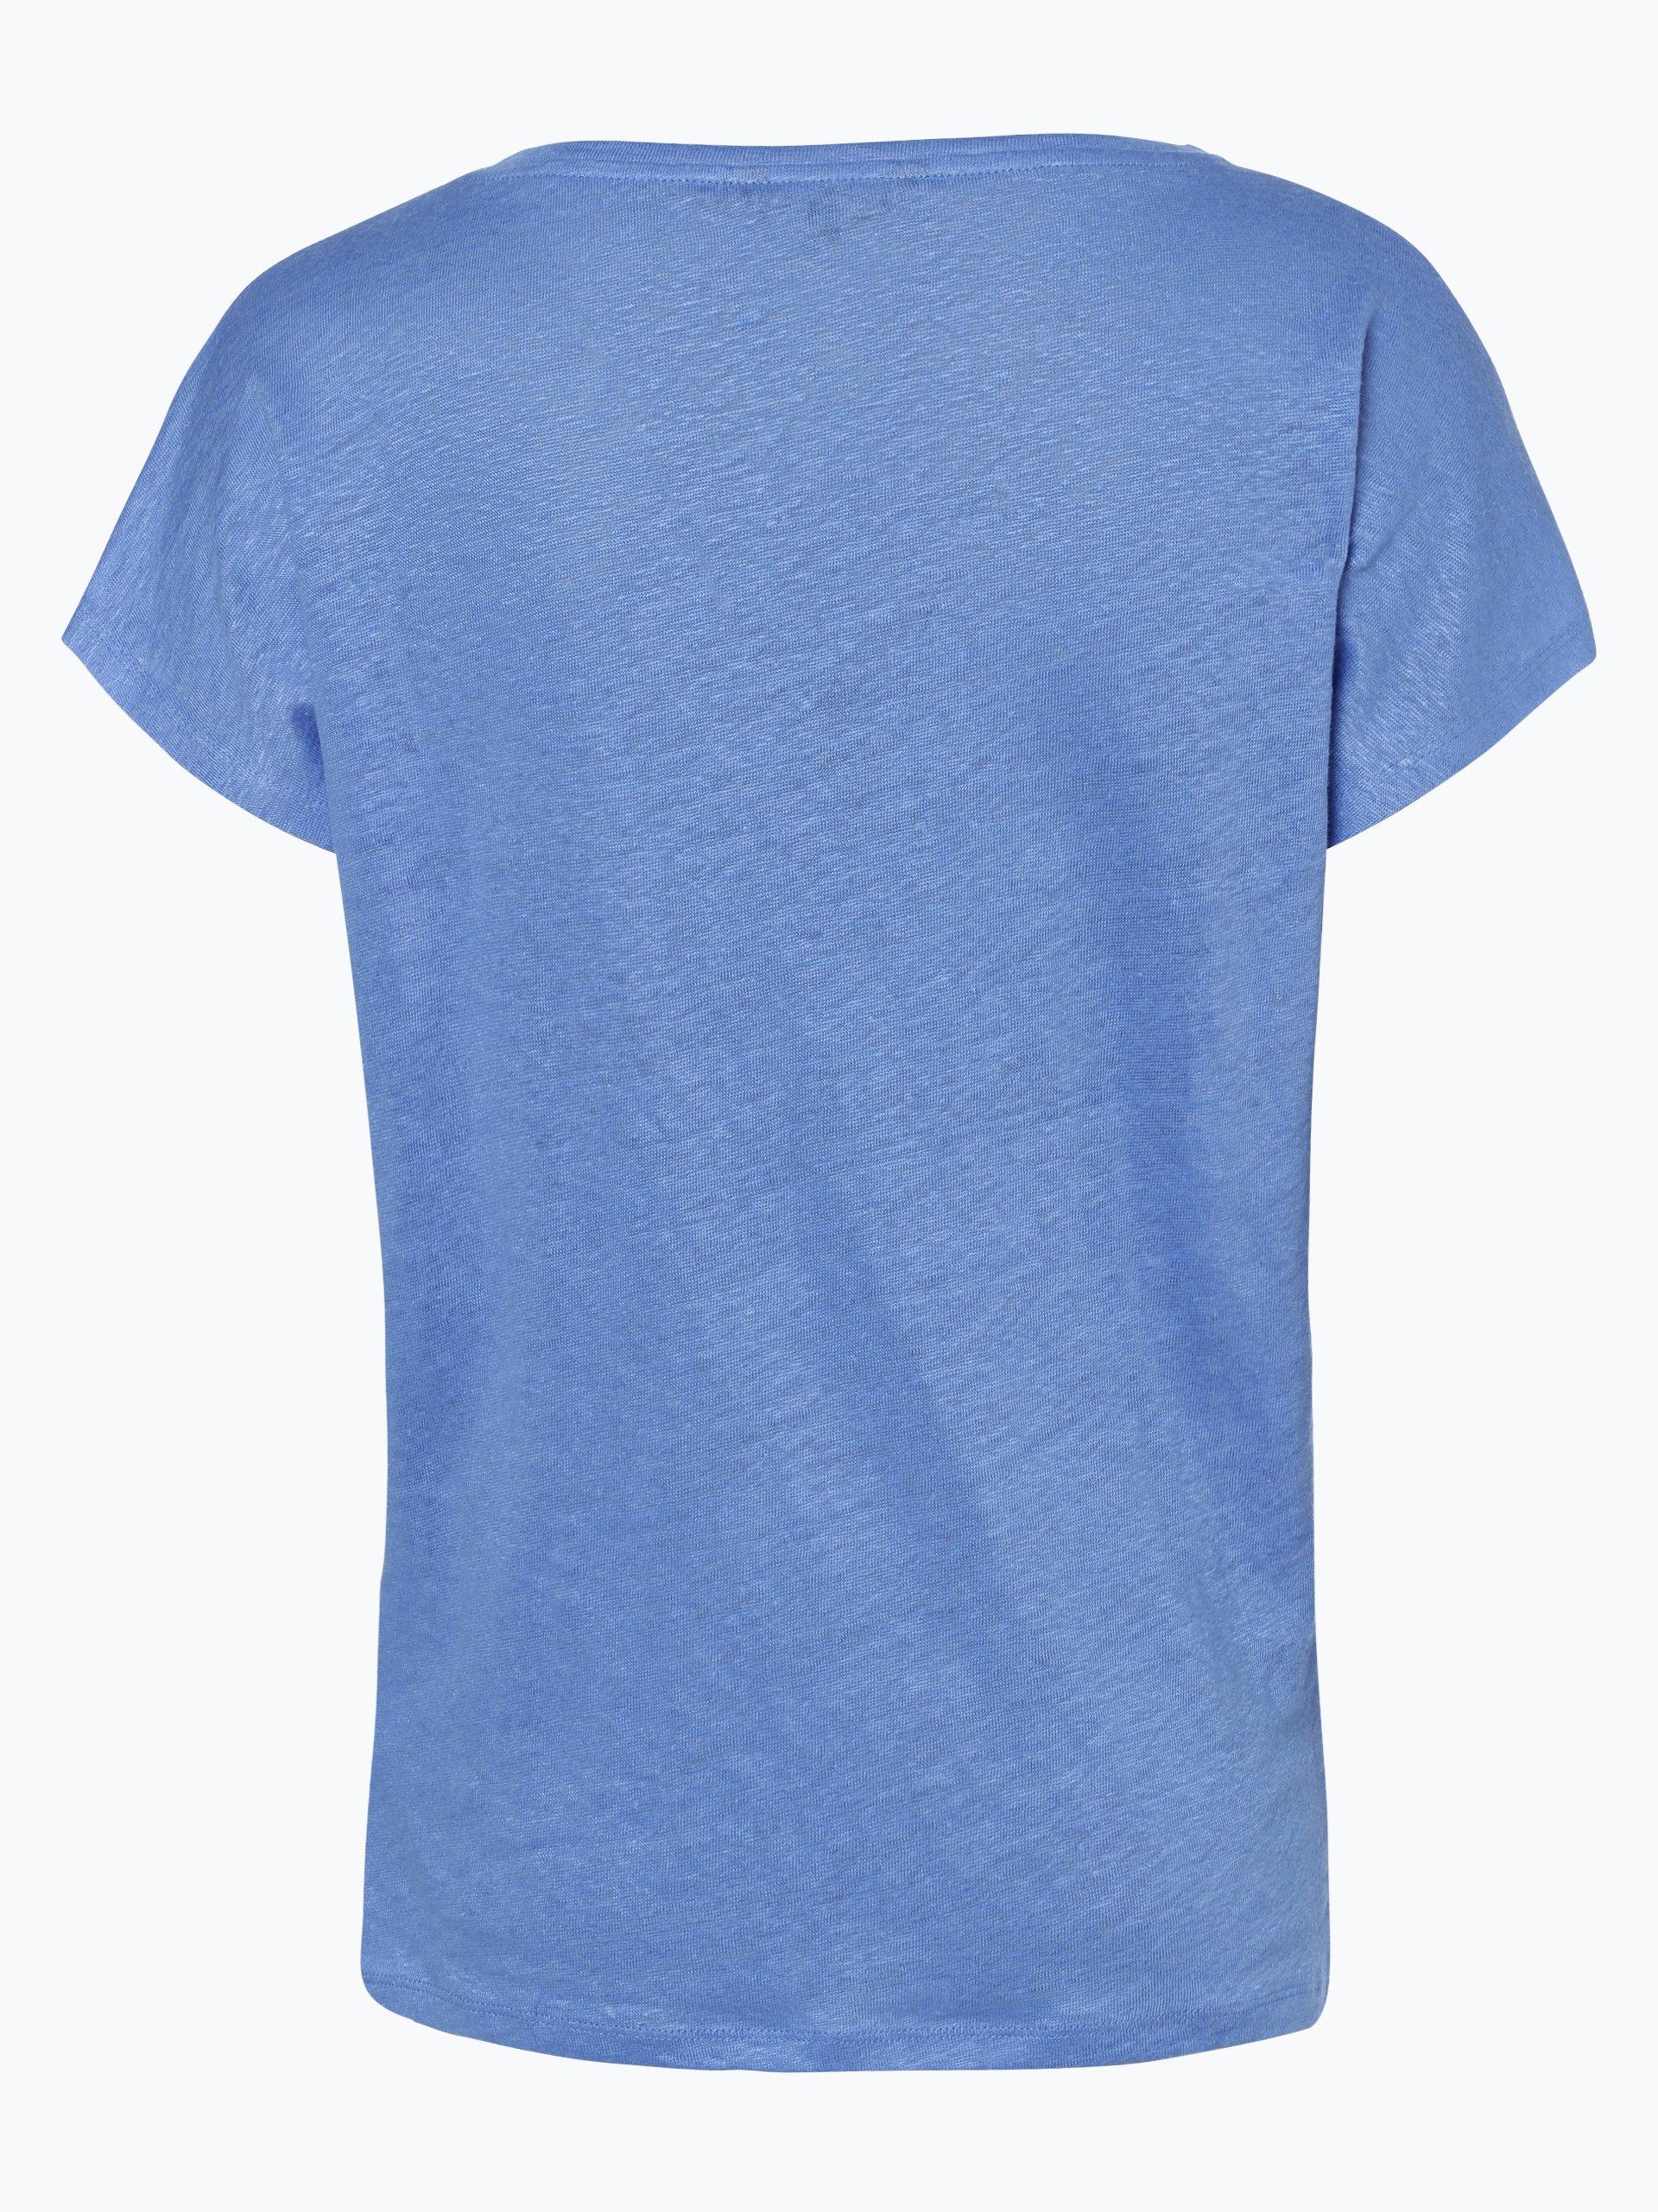 Tommy Hilfiger Damen Shirt aus Leinen